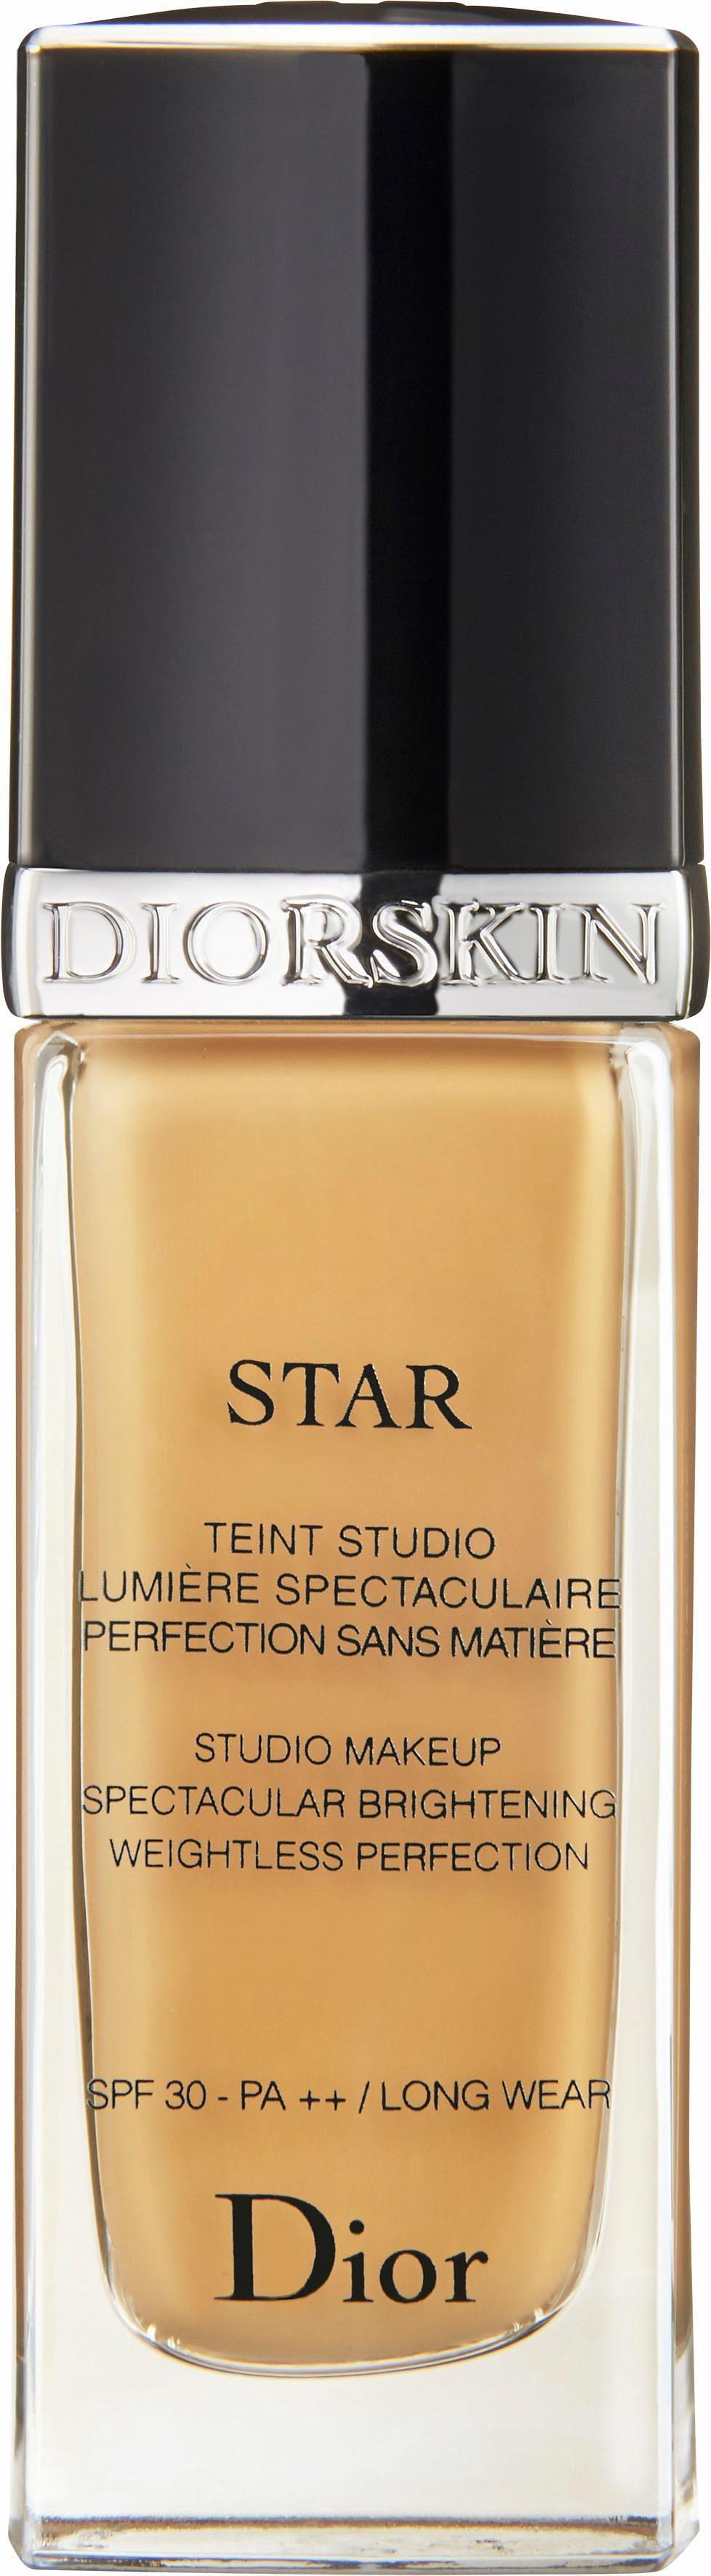 Dior Foundation Diorskin Star